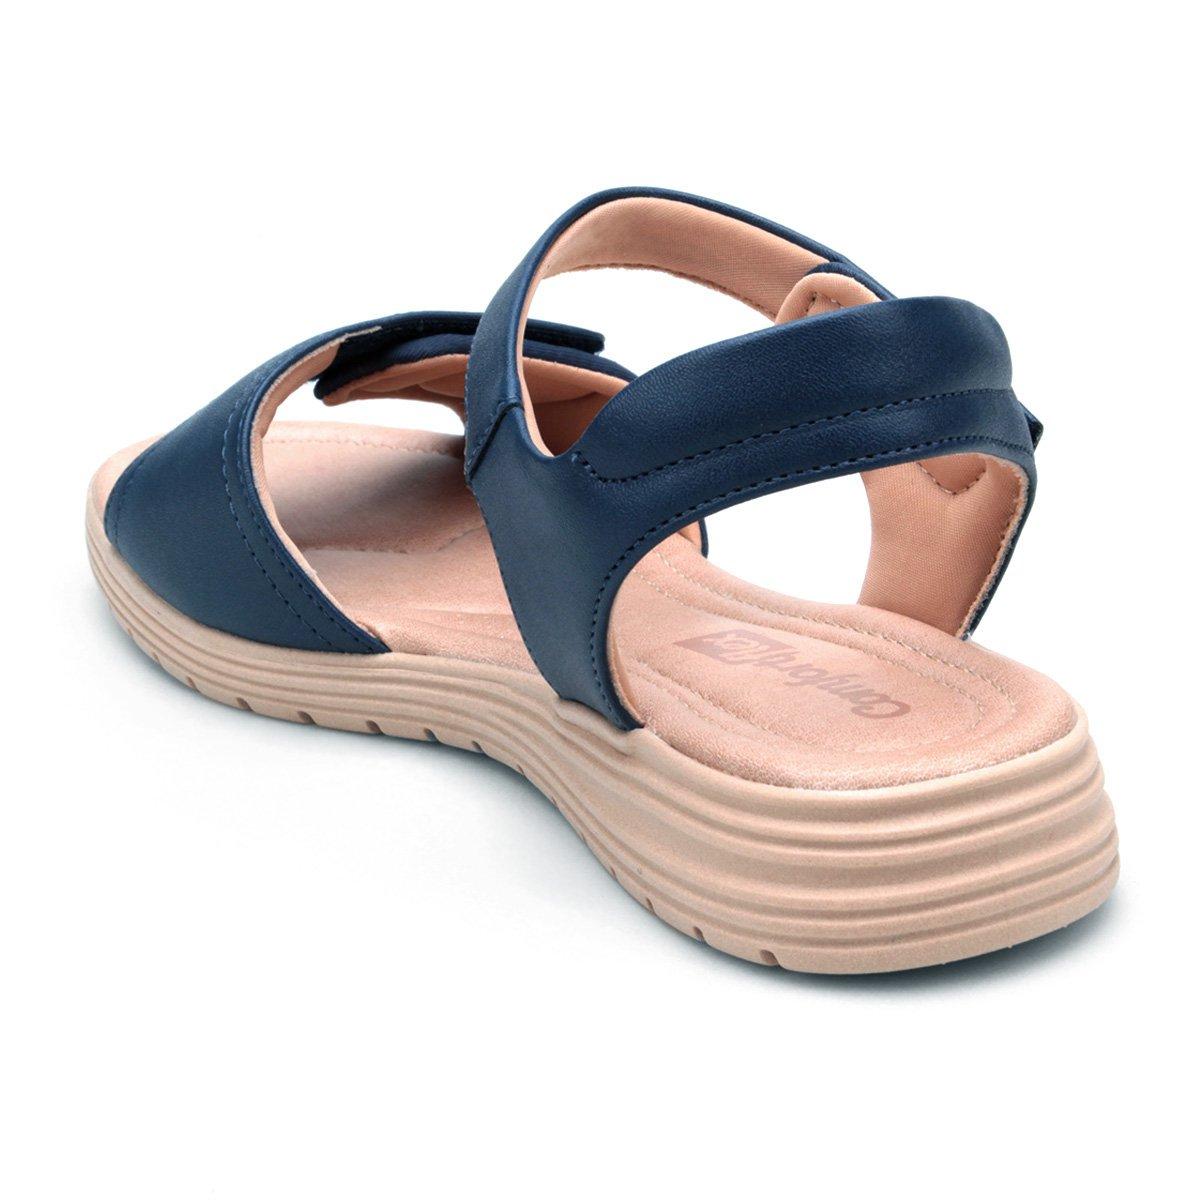 Sandália Sandália Velcro Papete Comfortflex Marinho Comfortflex Feminina 0rxRgq0w